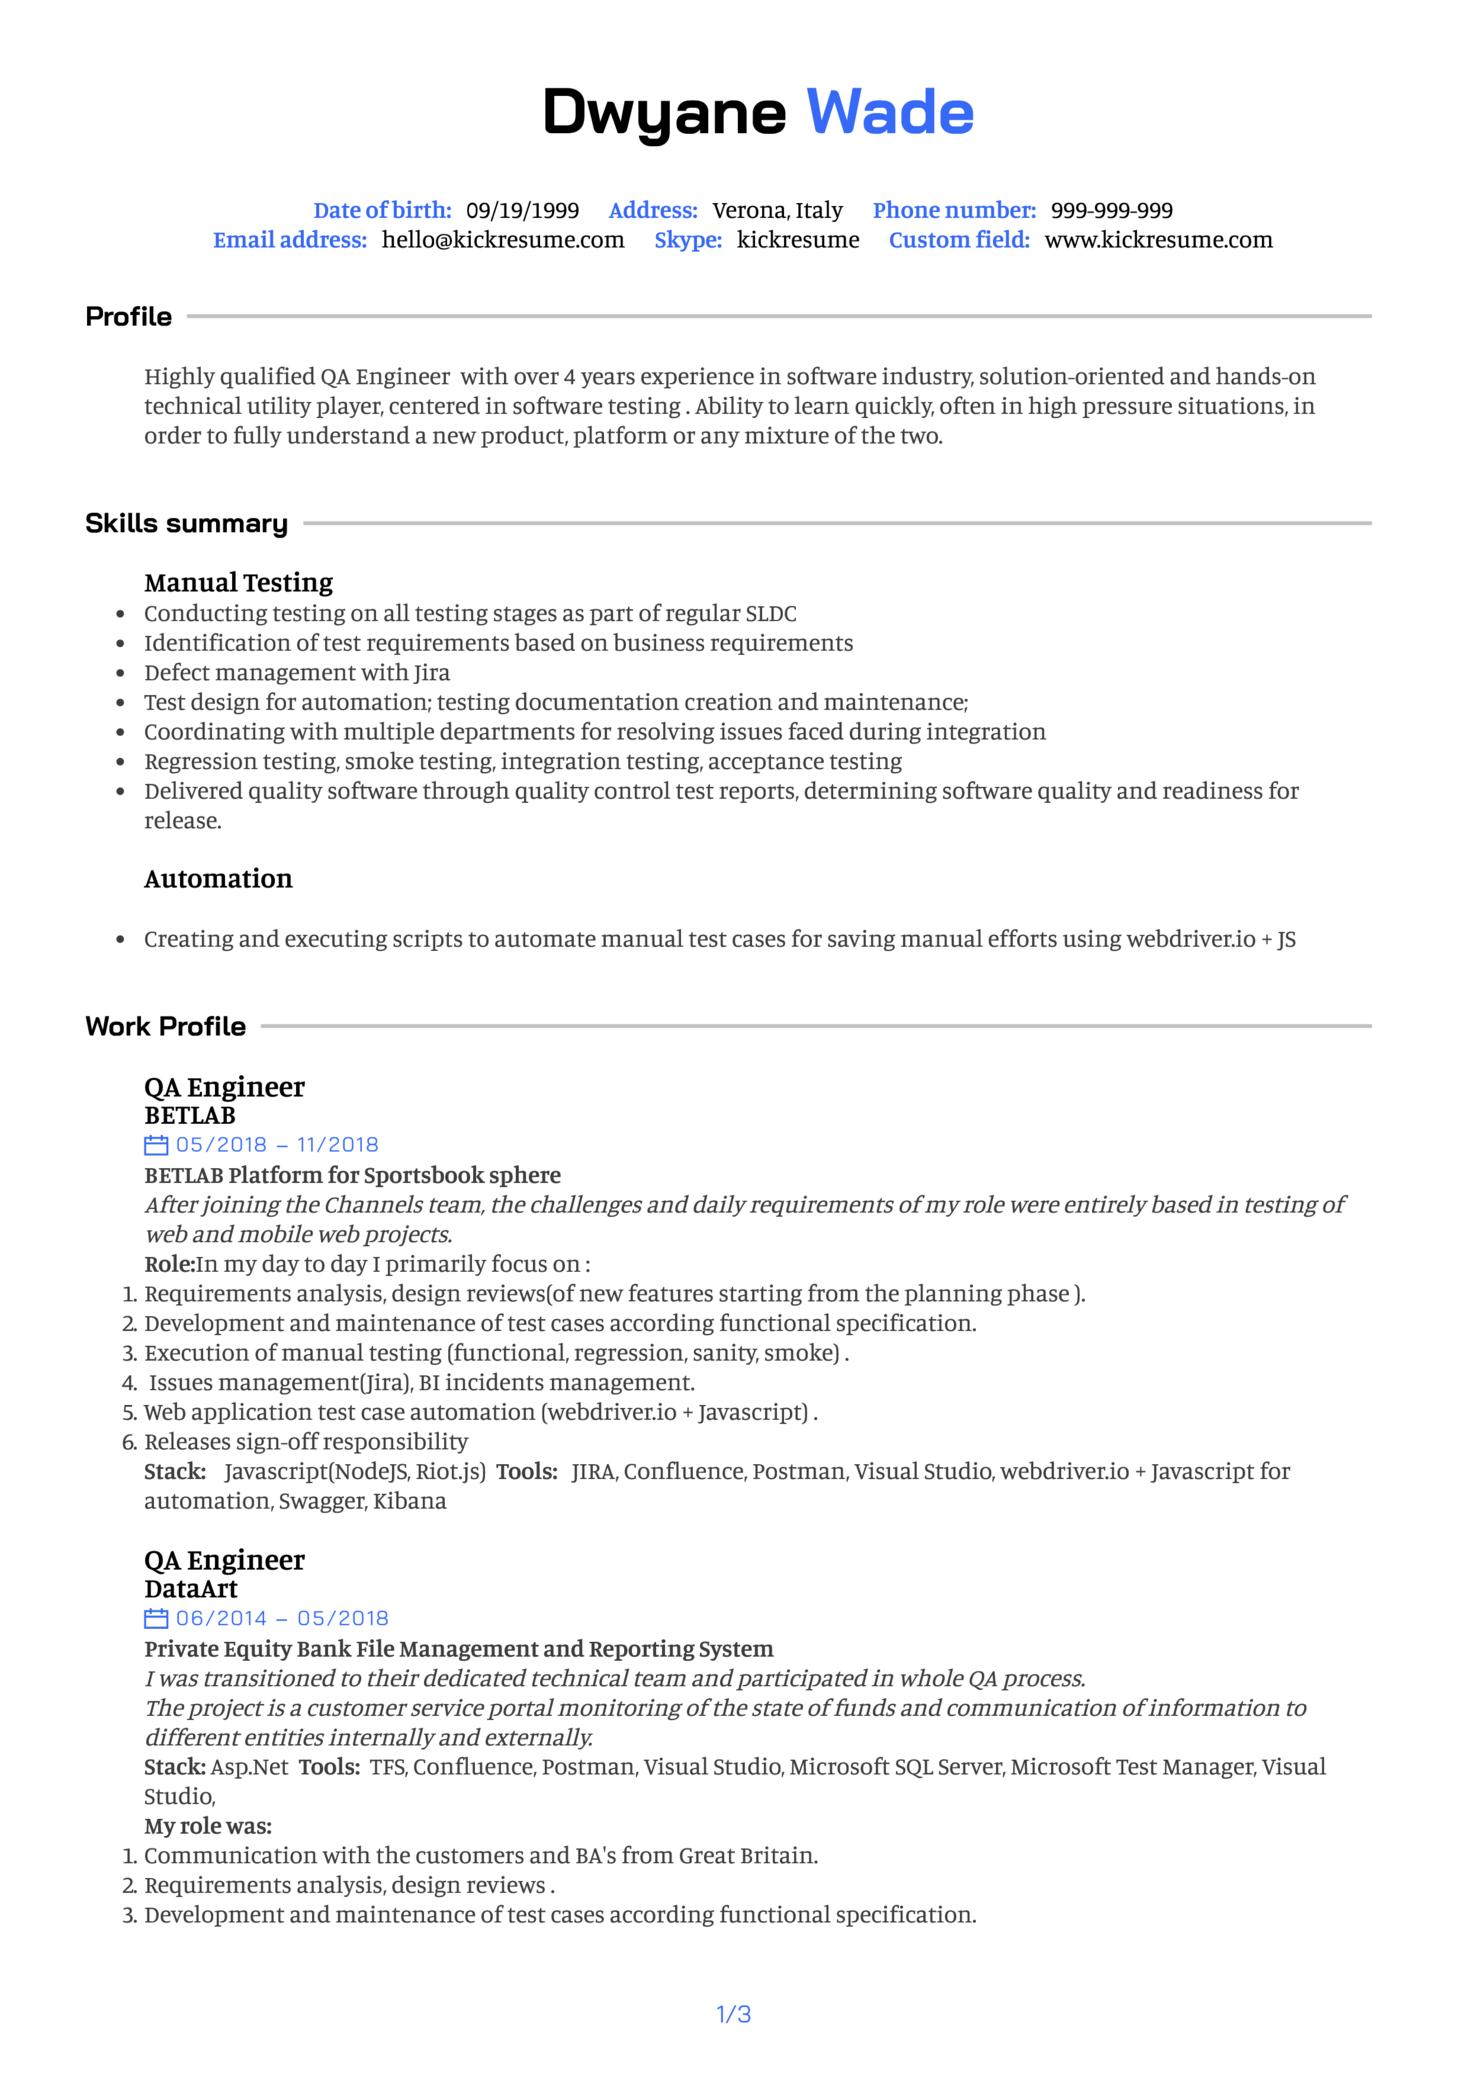 Quality Assurance Engineer Resume Example (Teil 1)